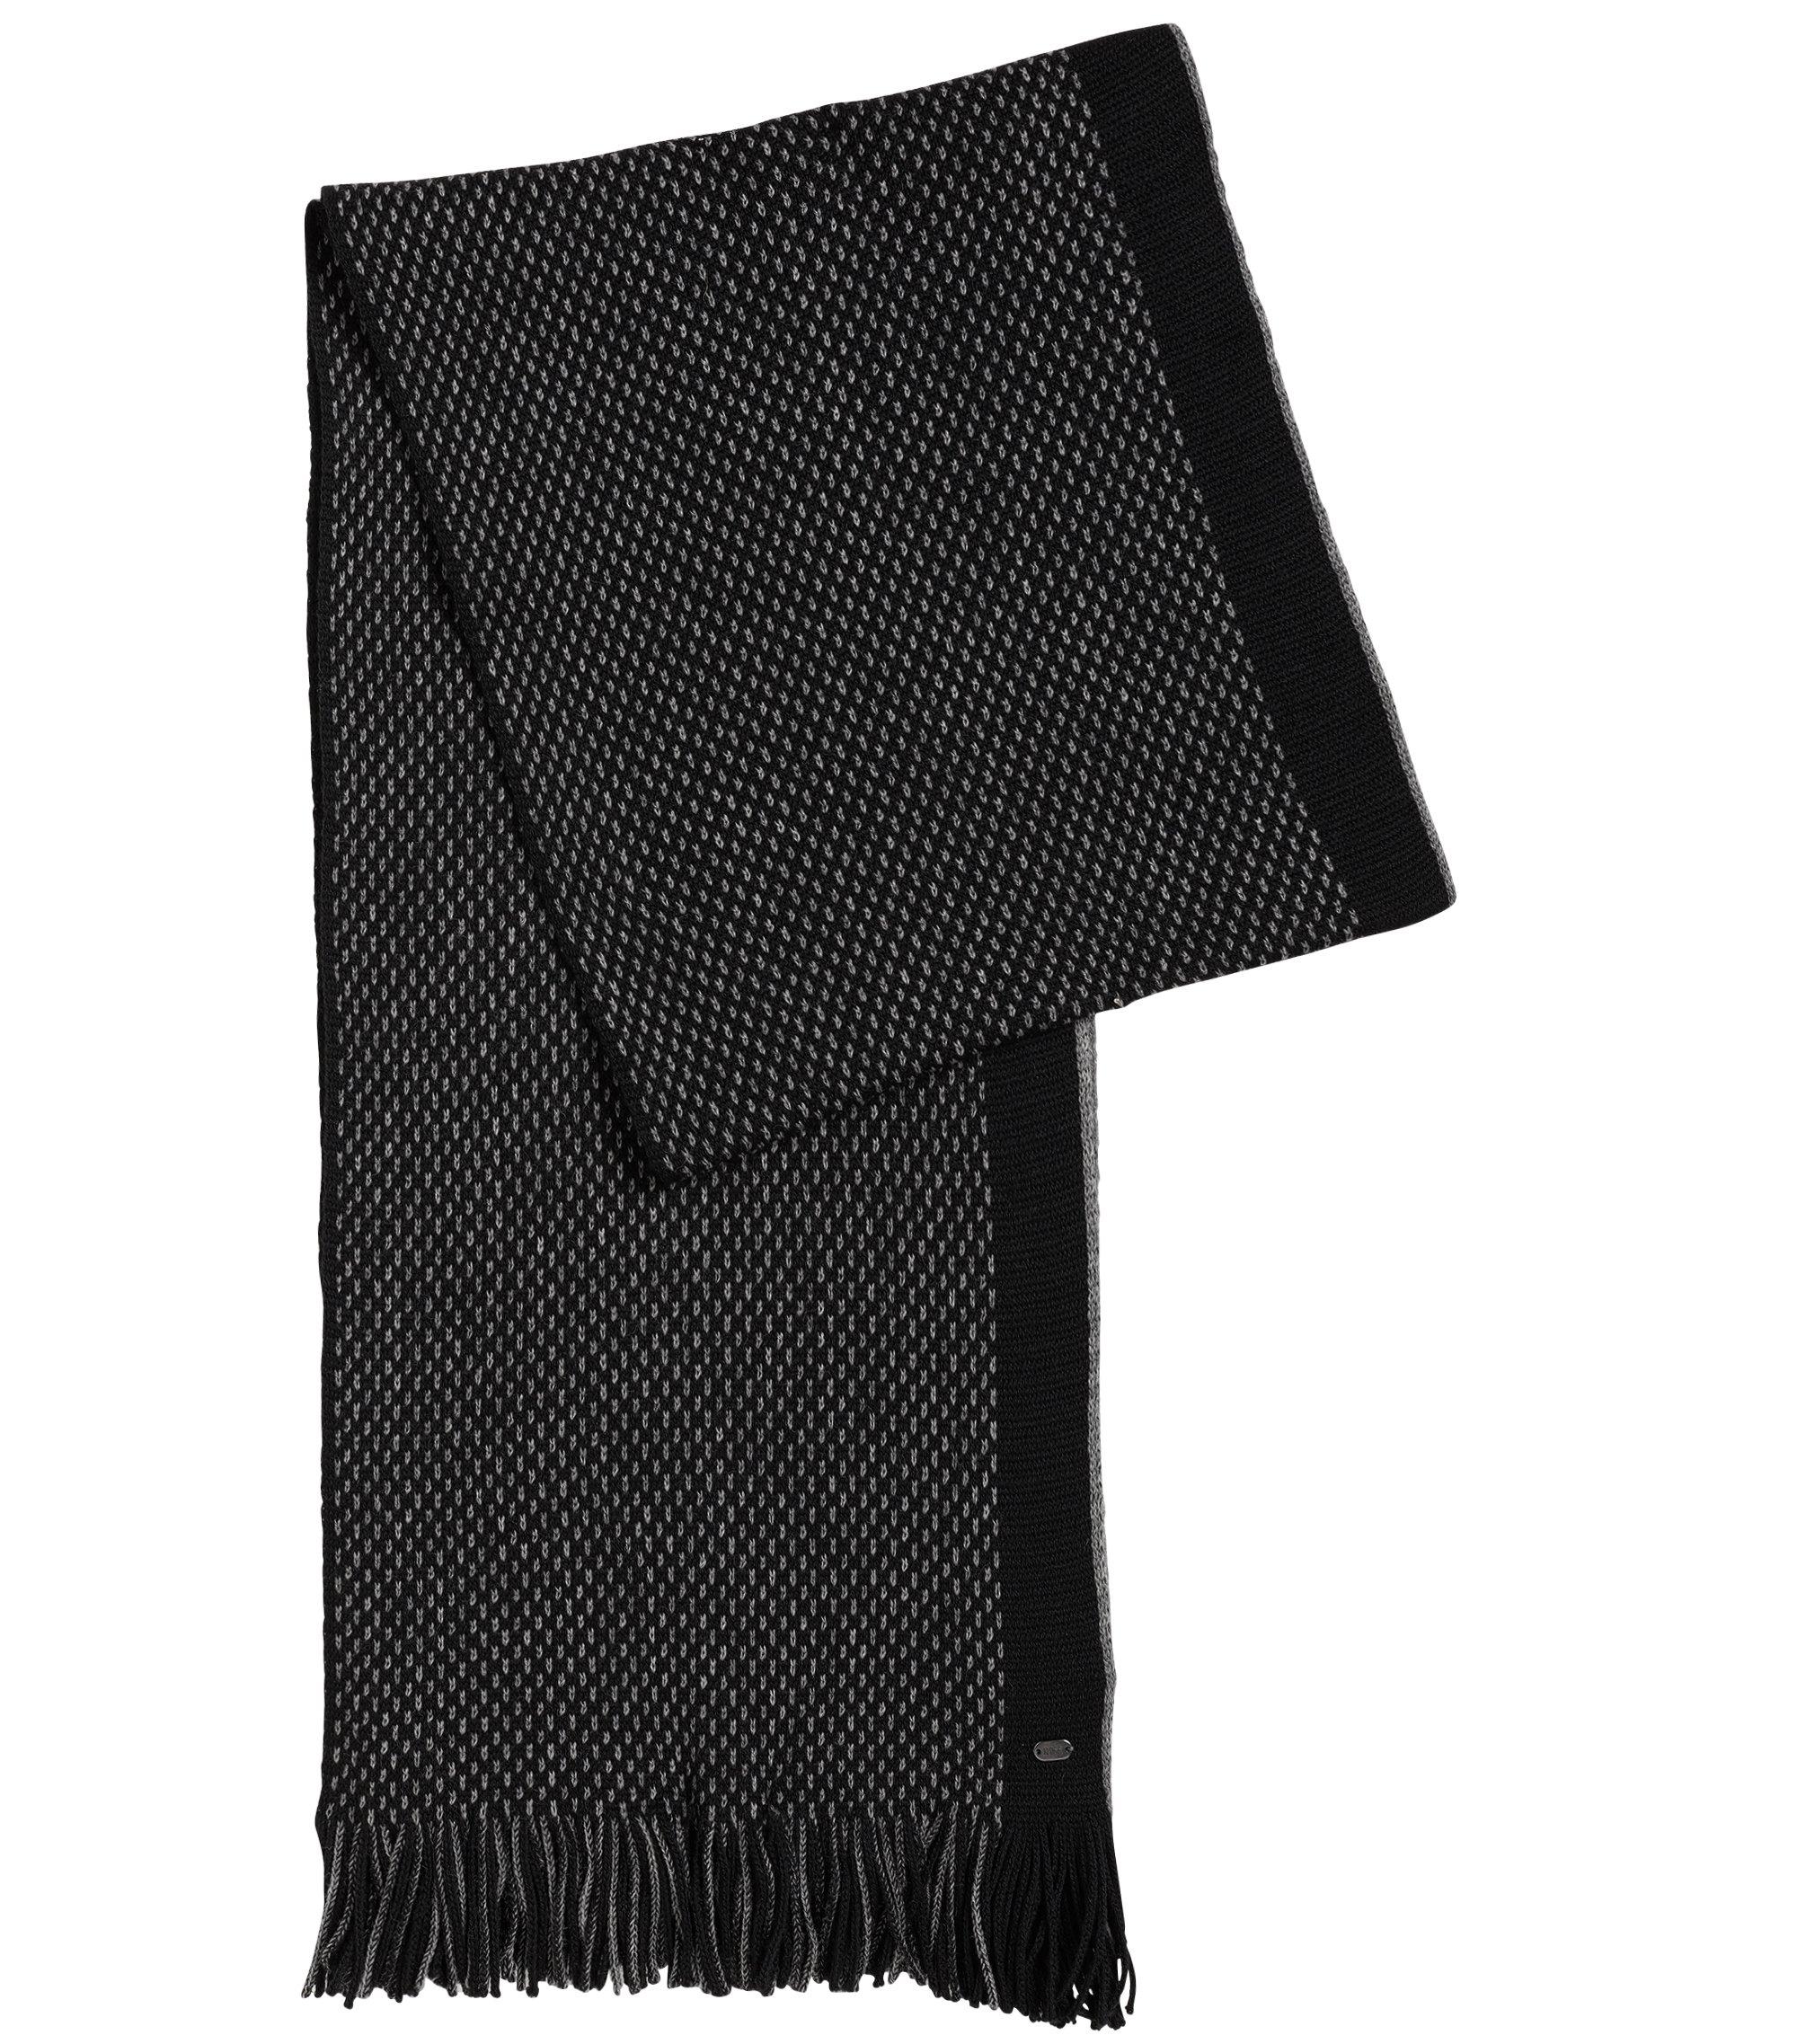 Knit Virgin Wool Scarf | C-Fadon, Black